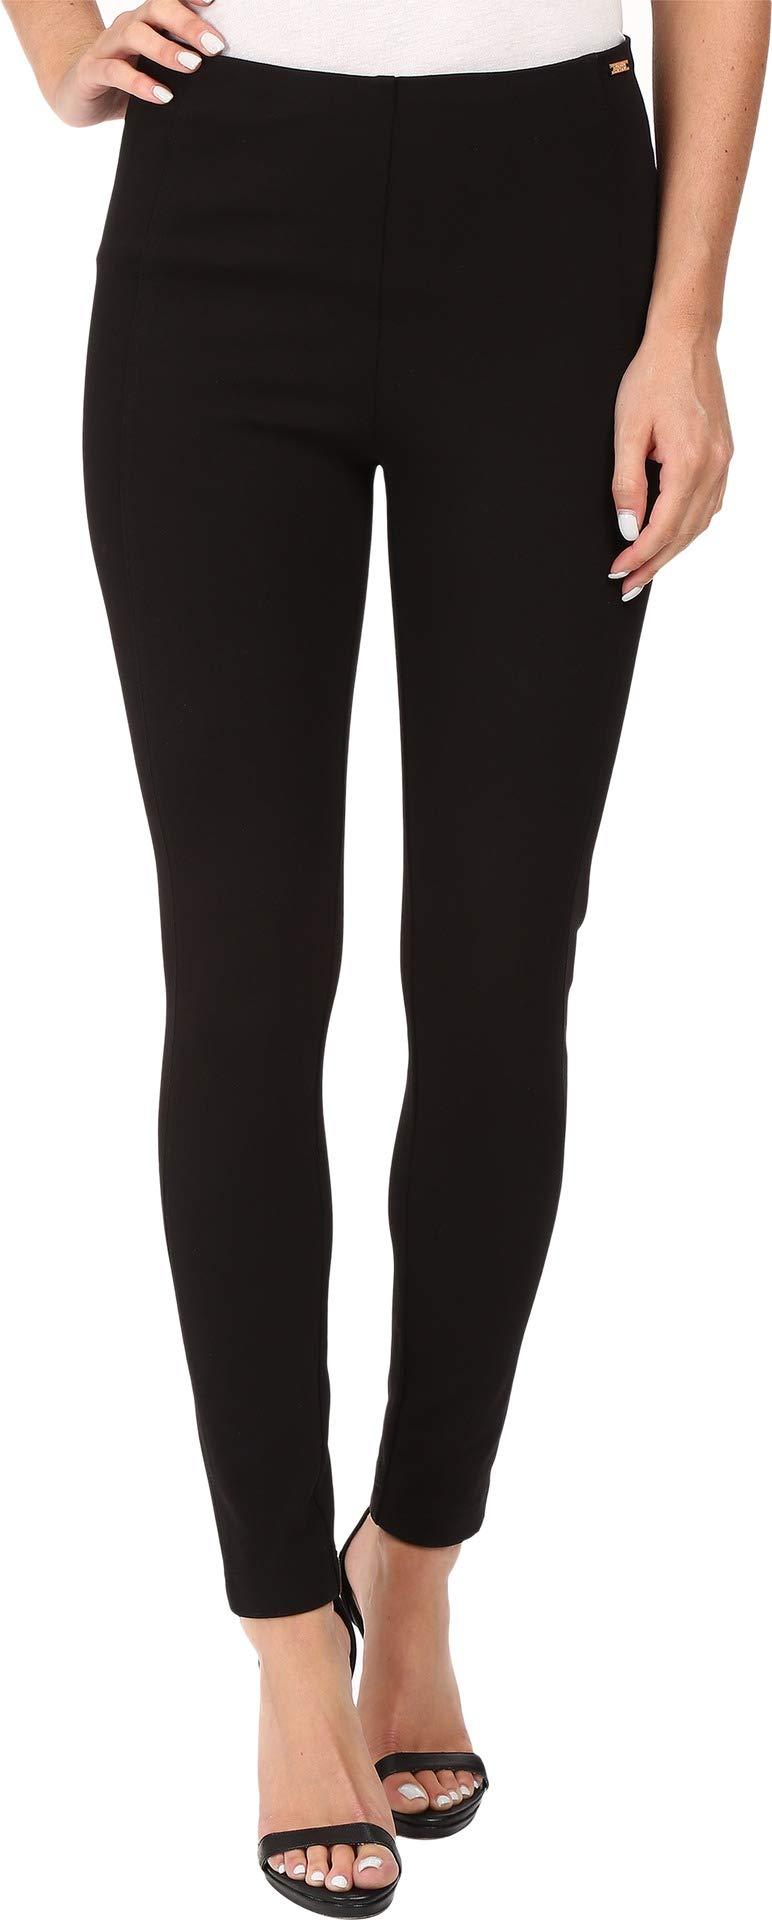 Ivanka Trump Women's Ponte Compression Pants Black Medium 27 27